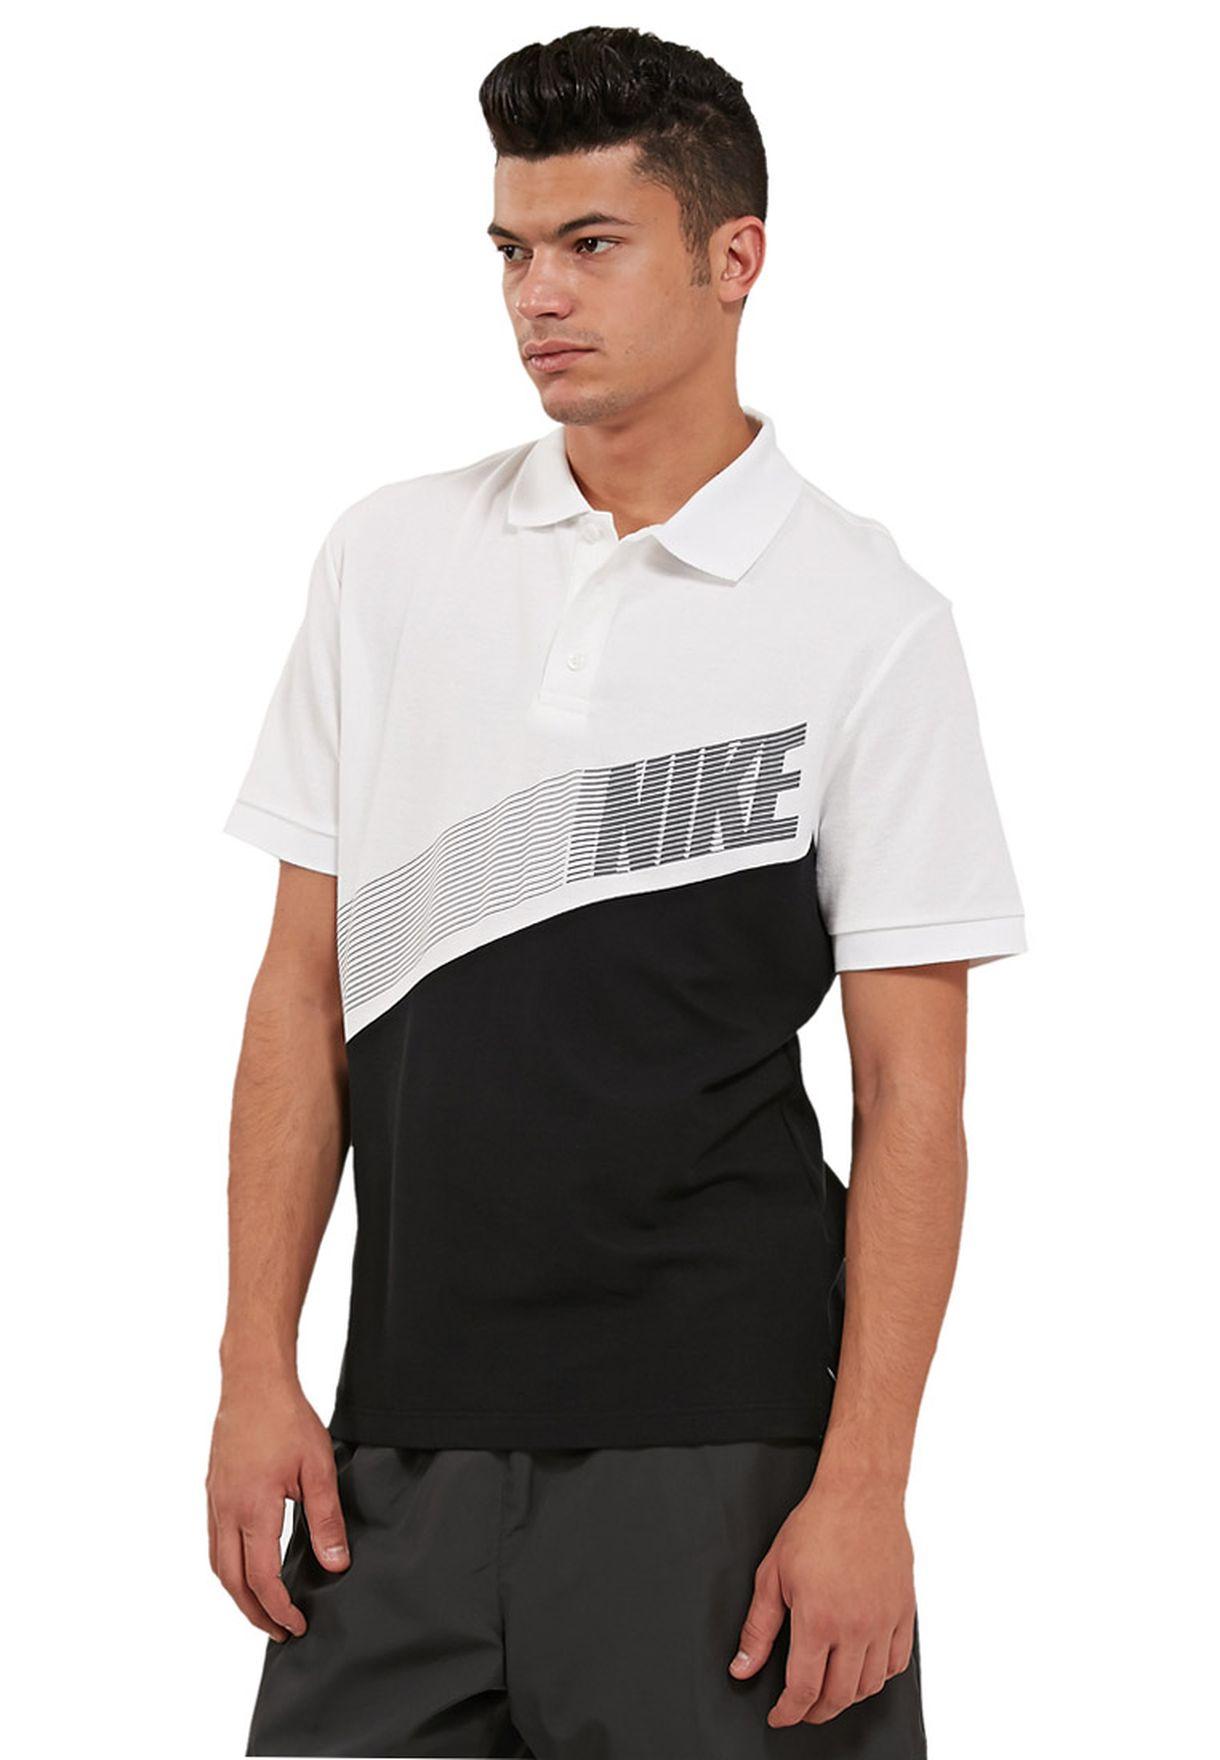 ac7346680 Shop Nike white Matchup Polo Shirt NKAP584845-101 for Men in UAE ...